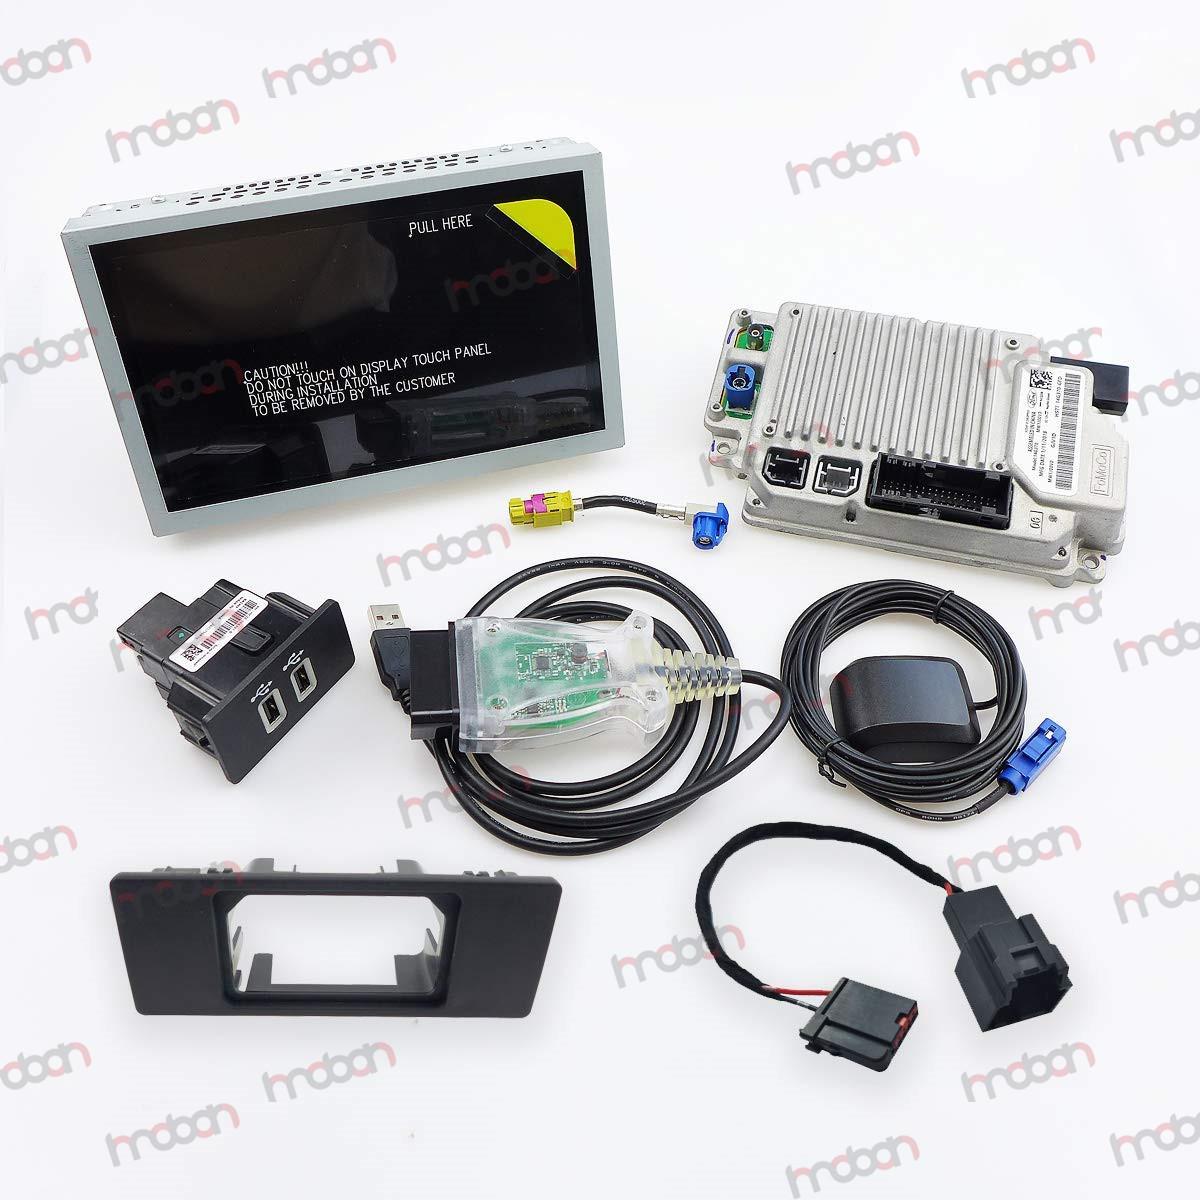 Genuine Sync 2 To Sync 3 Upgrade Kit For Ford Lincoln Apim Module W Carplay Nav Ebay